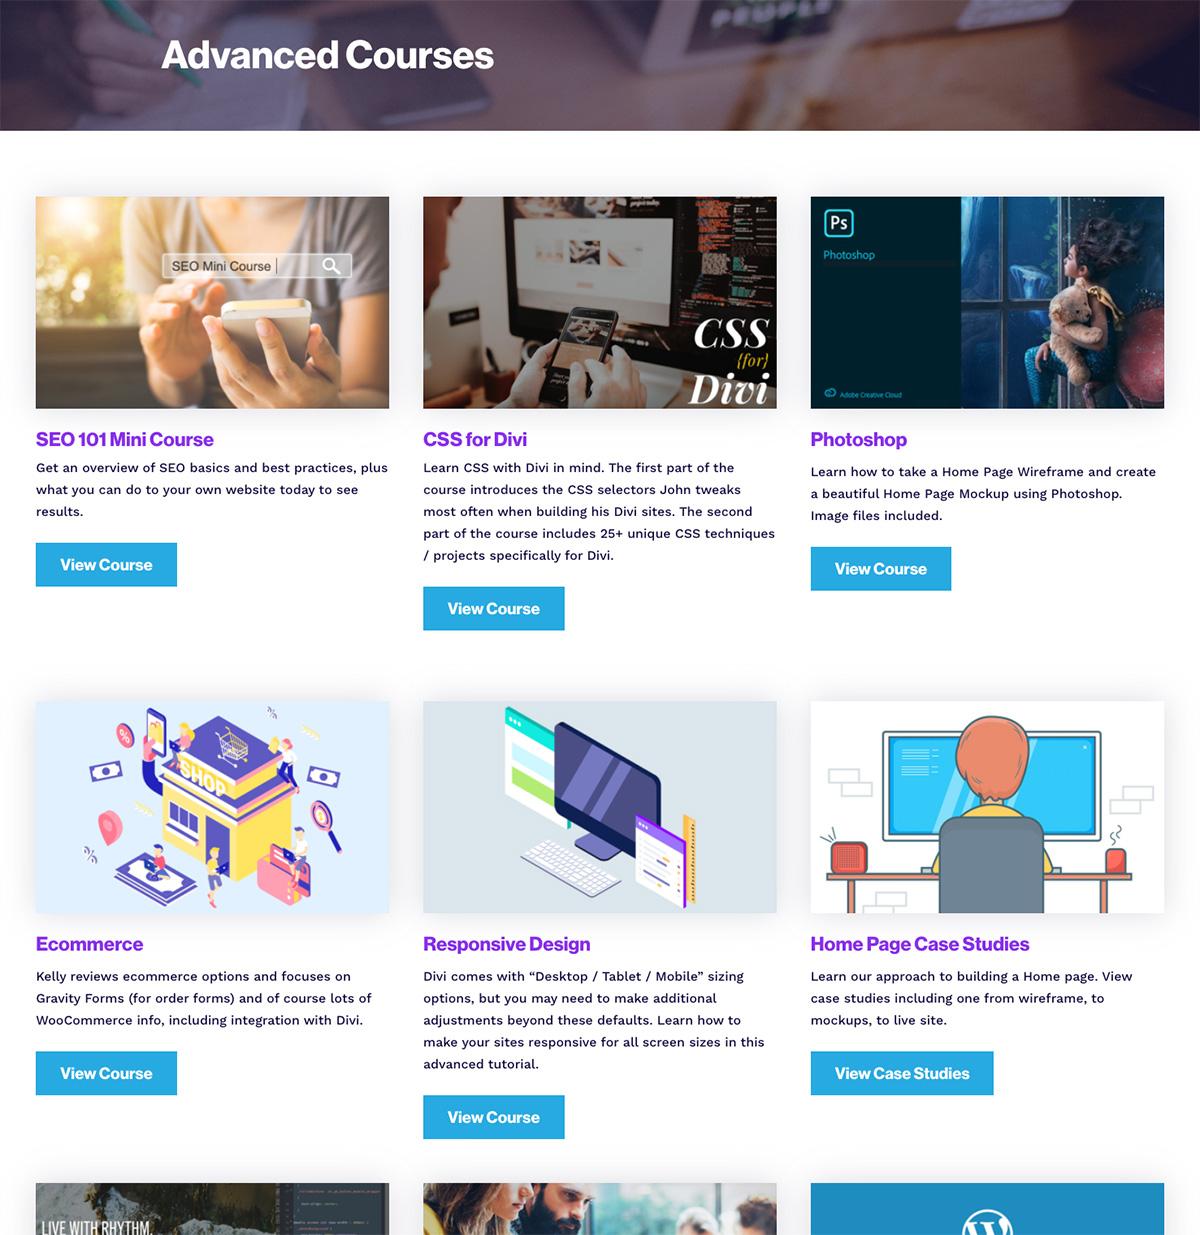 Advanced Courses Screen